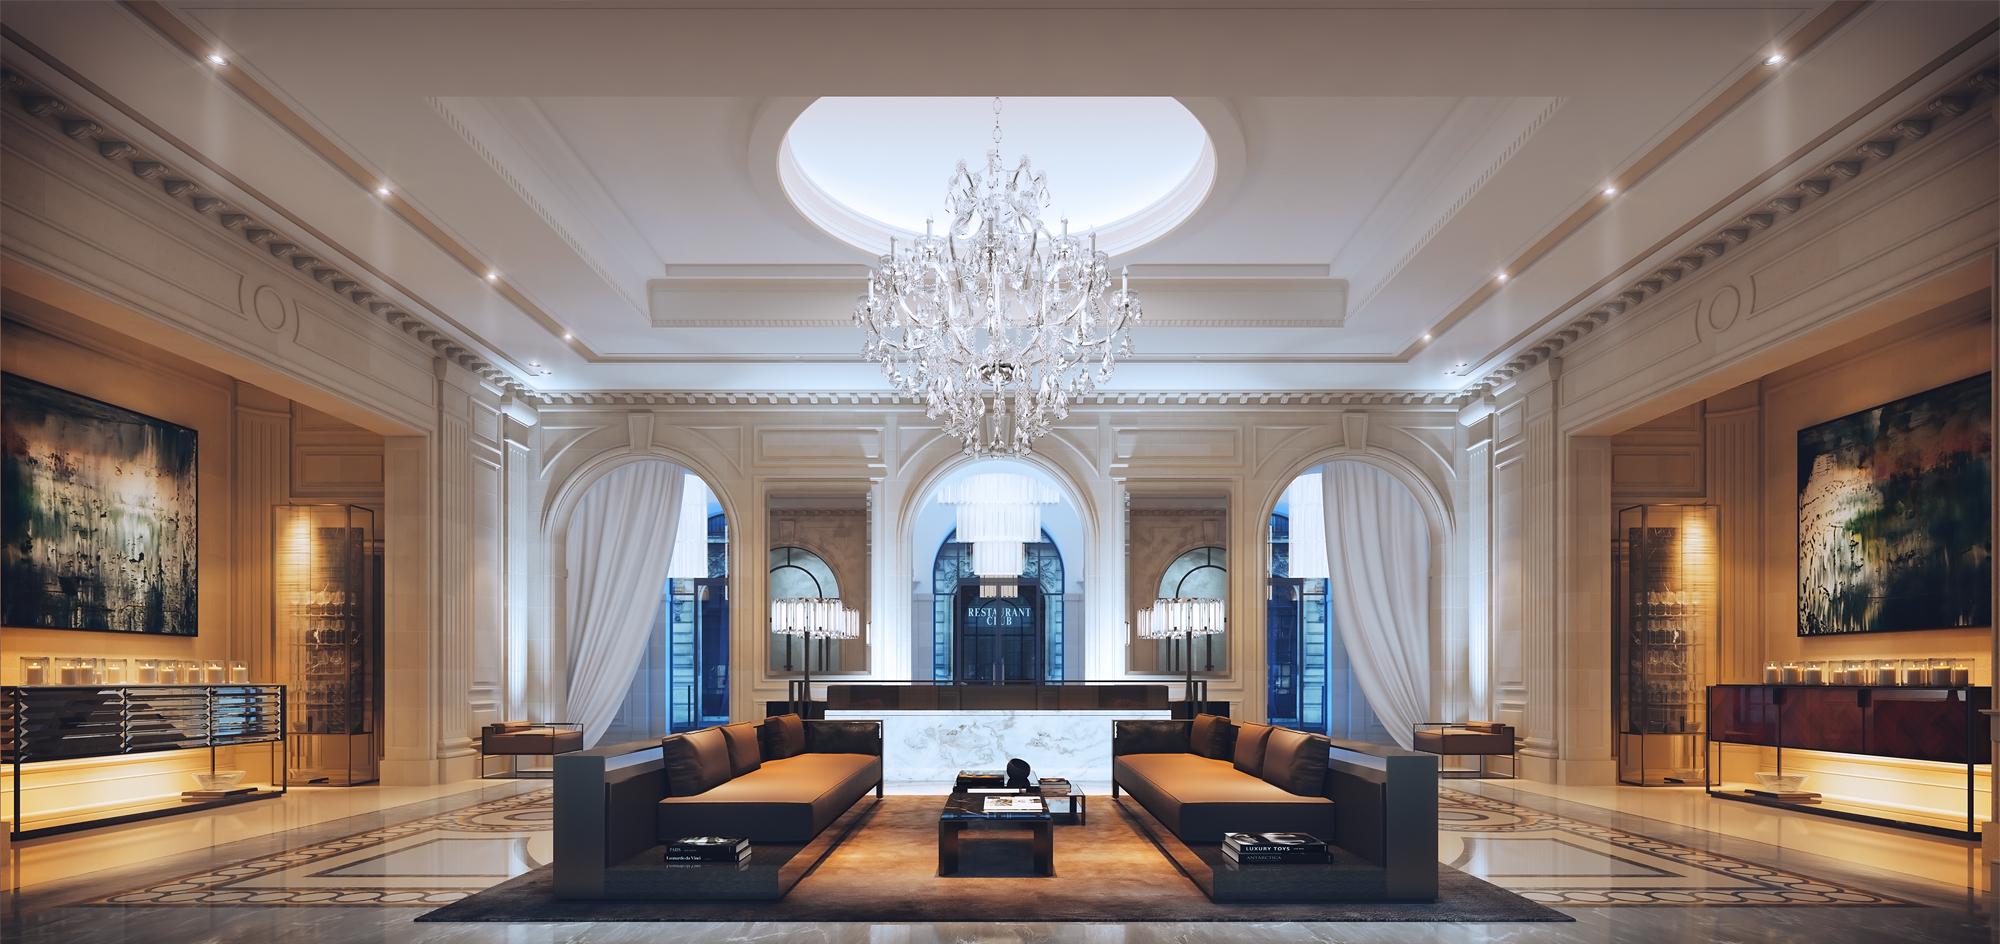 Making Of Four Seasons Hotel Lobby